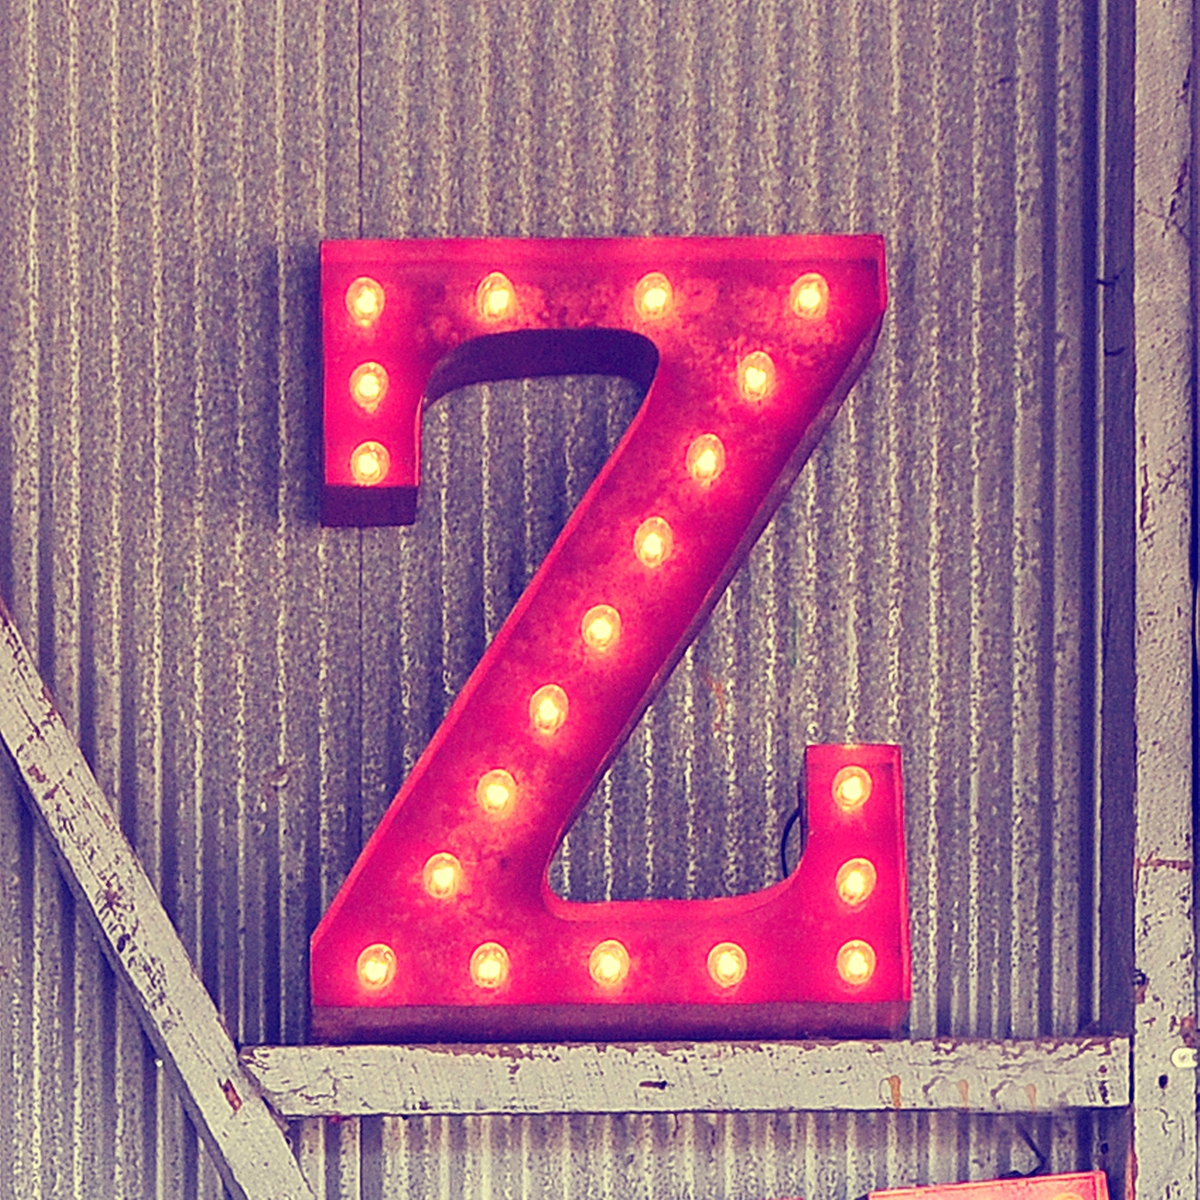 بالصور صور حرف z , خلفيات رائعه جدا لحرف z 2656 1